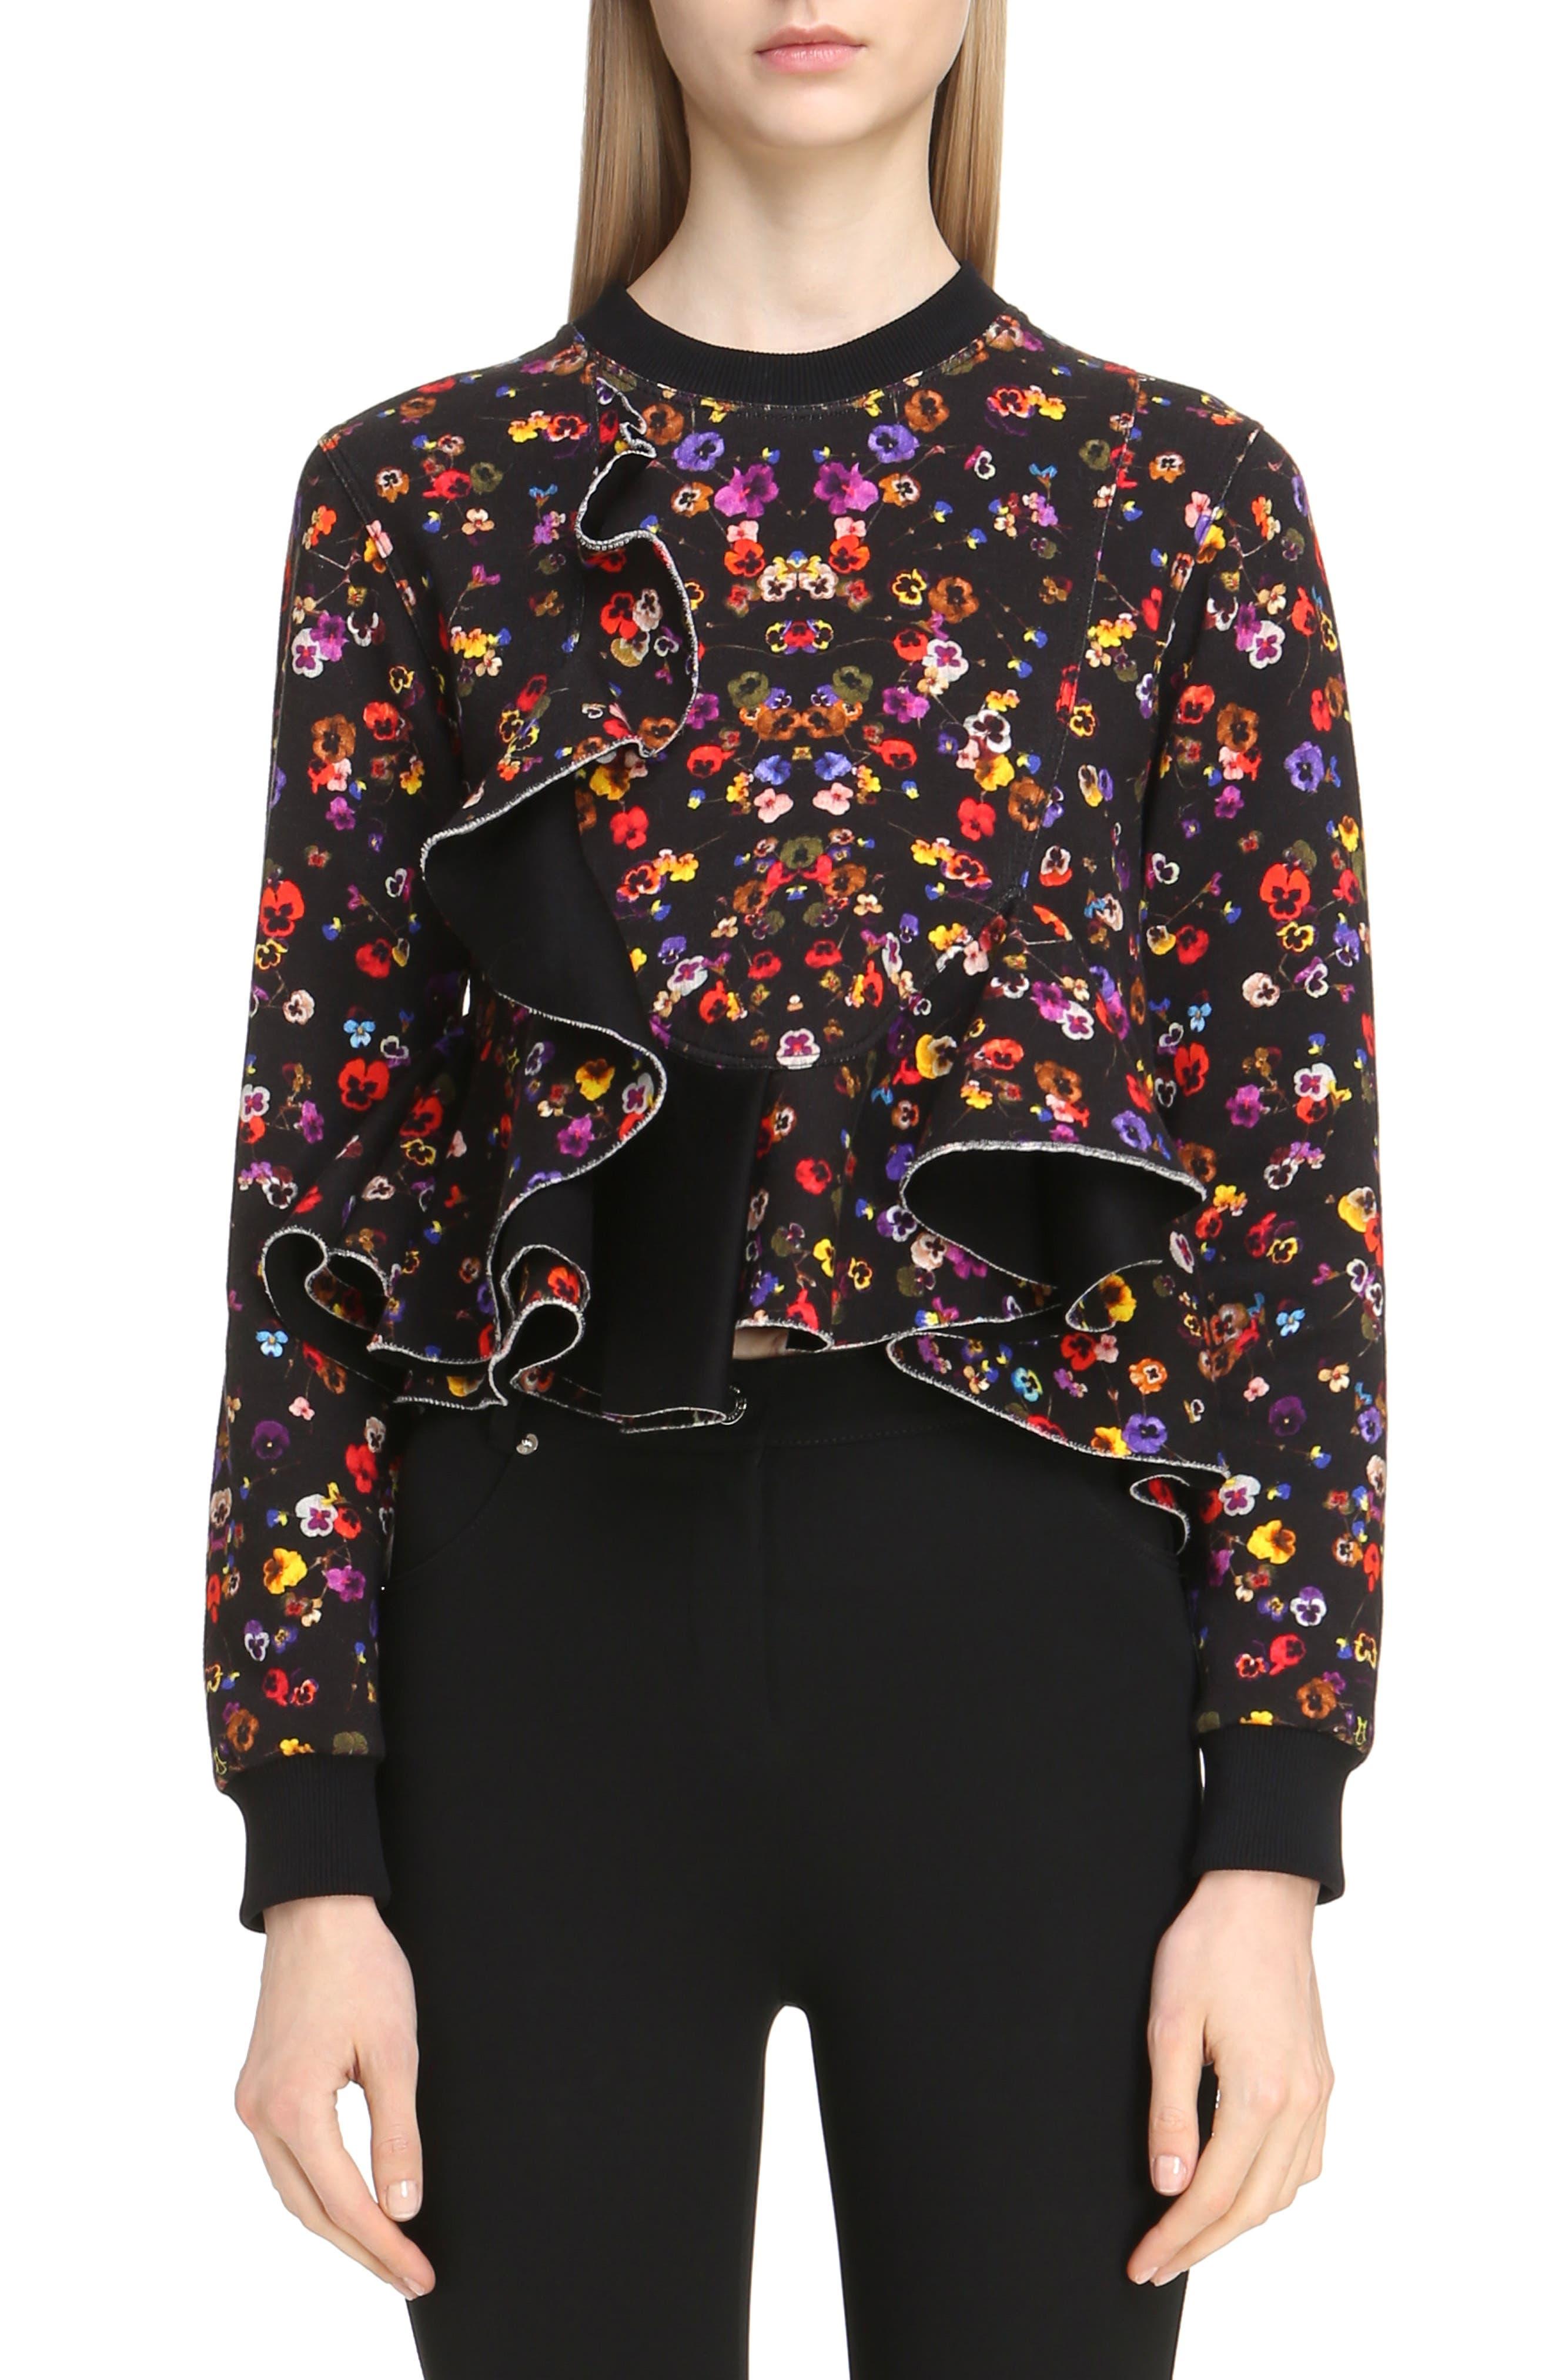 Alternate Image 1 Selected - Givenchy Floral Print Ruffle Bonded Sweatshirt